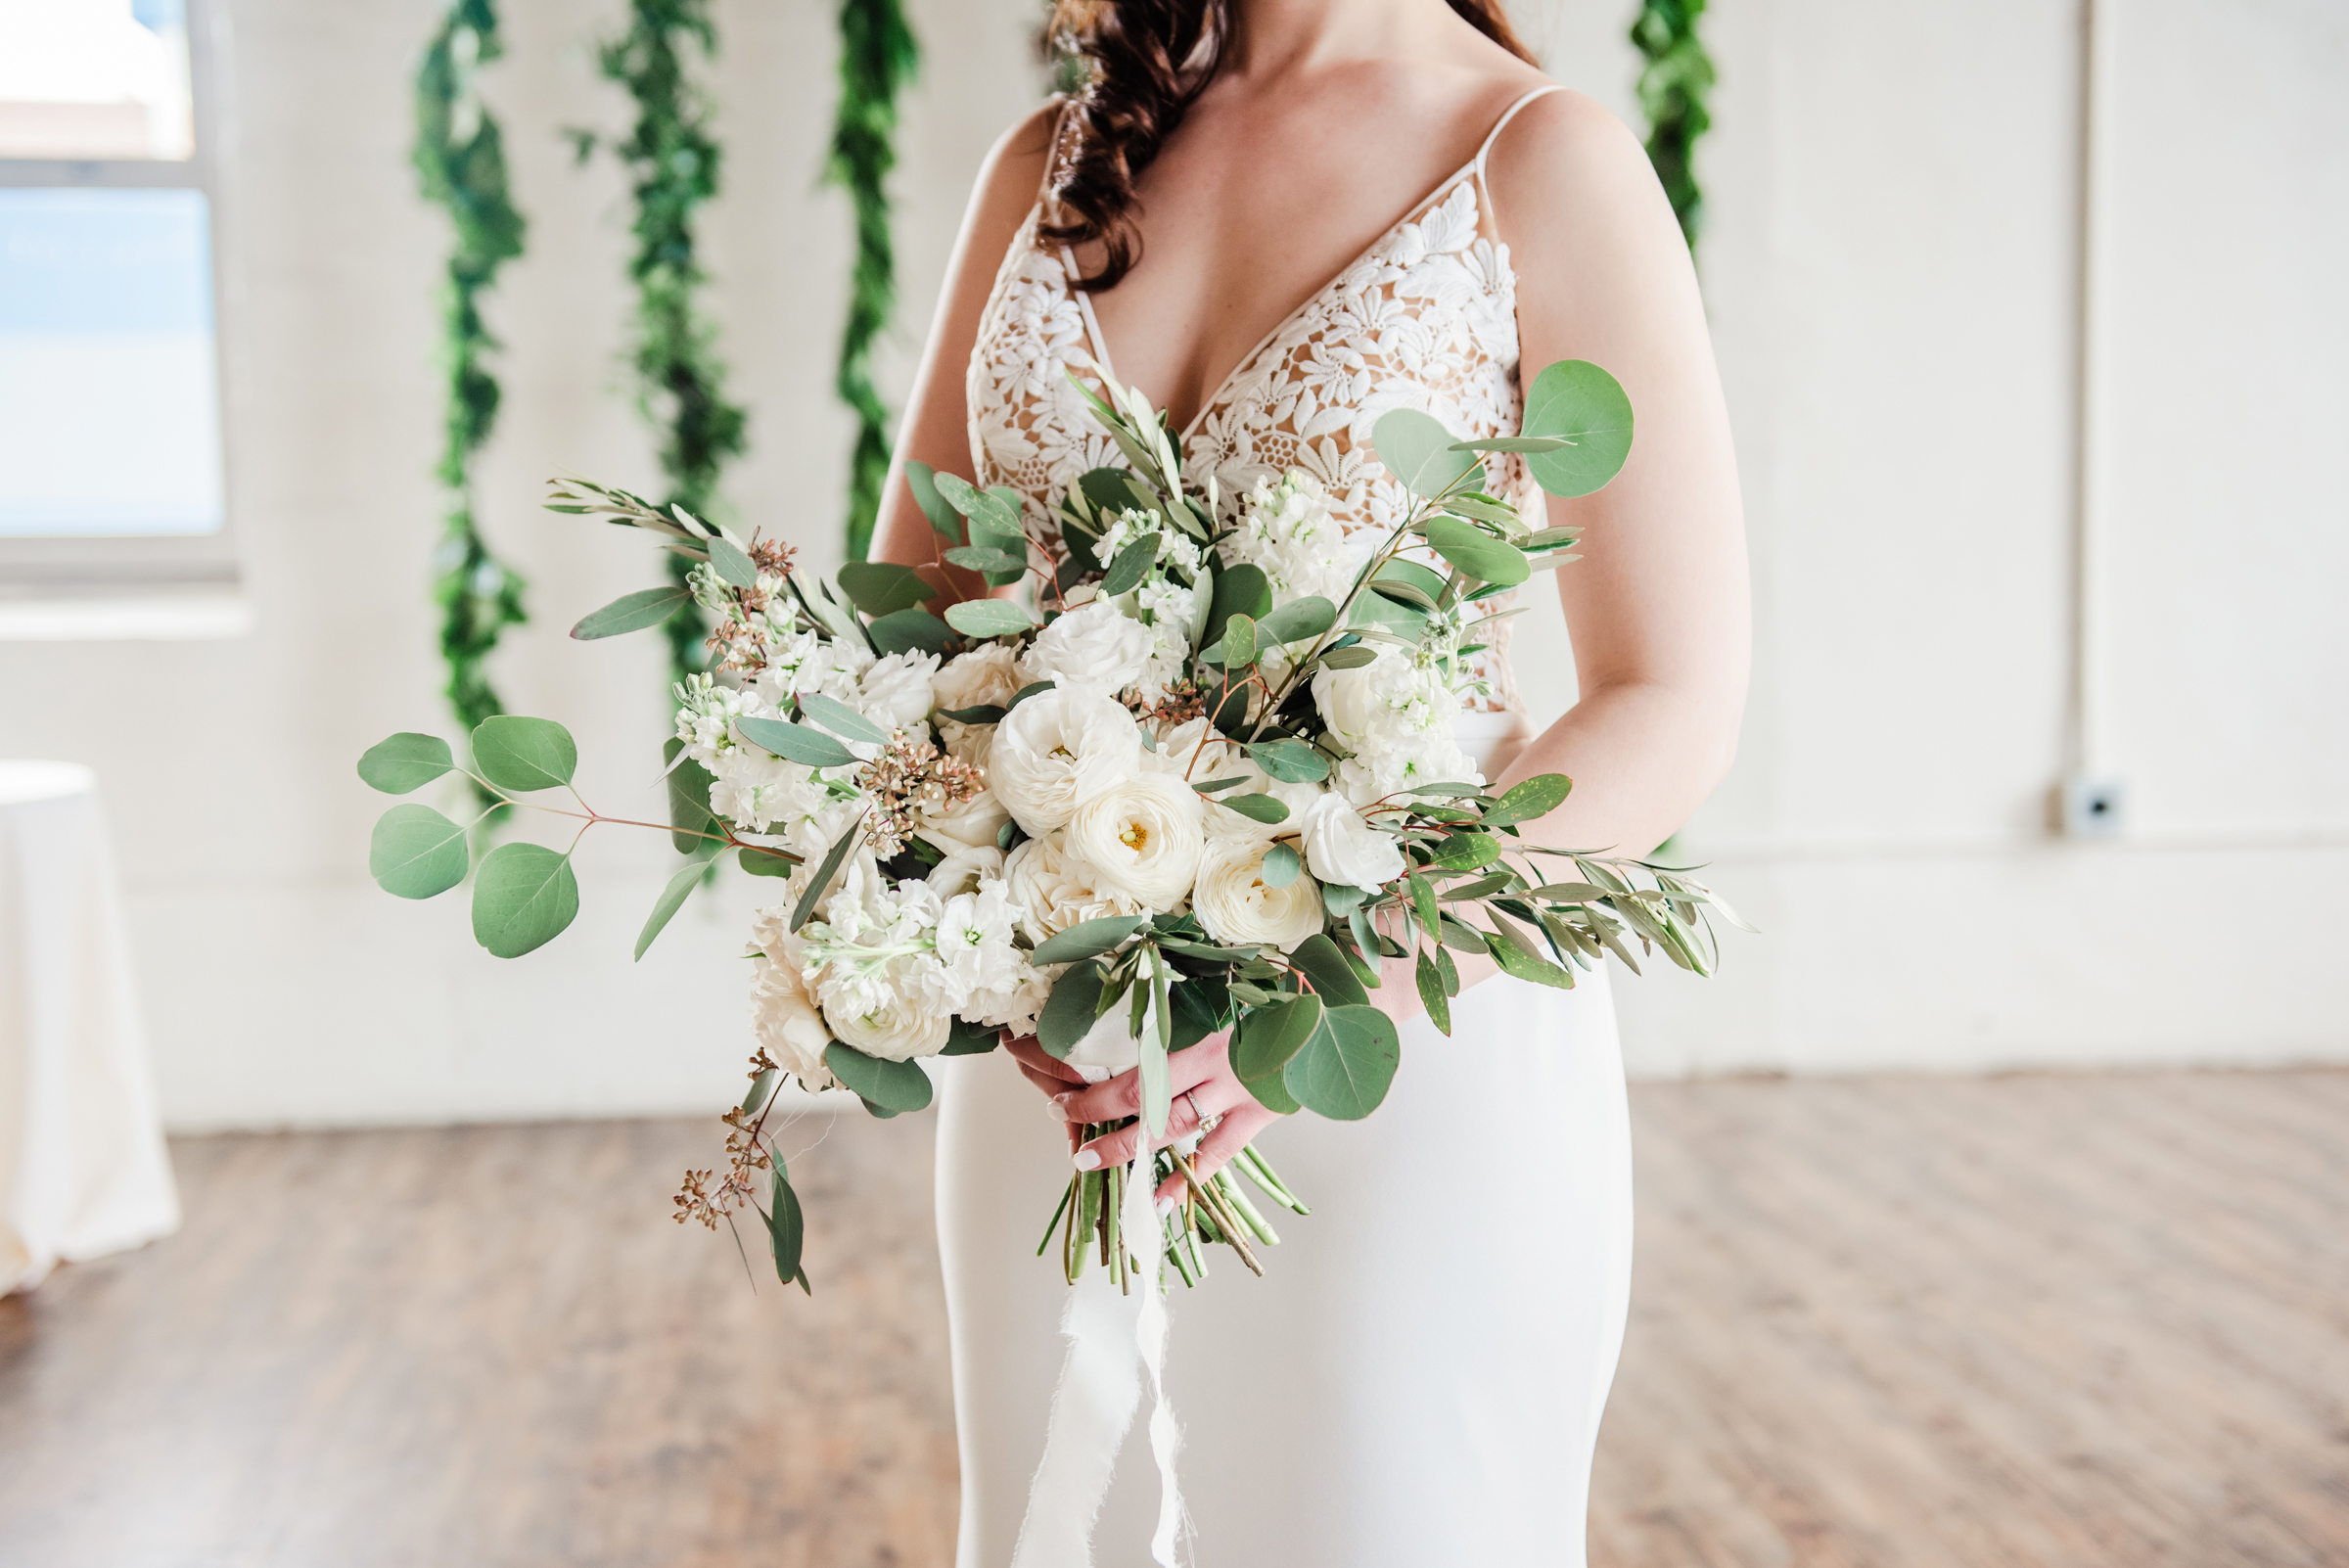 The_Arbor_LoftRochester_Wedding_JILL_STUDIO_Rochester_NY_Photographer_161858.jpg